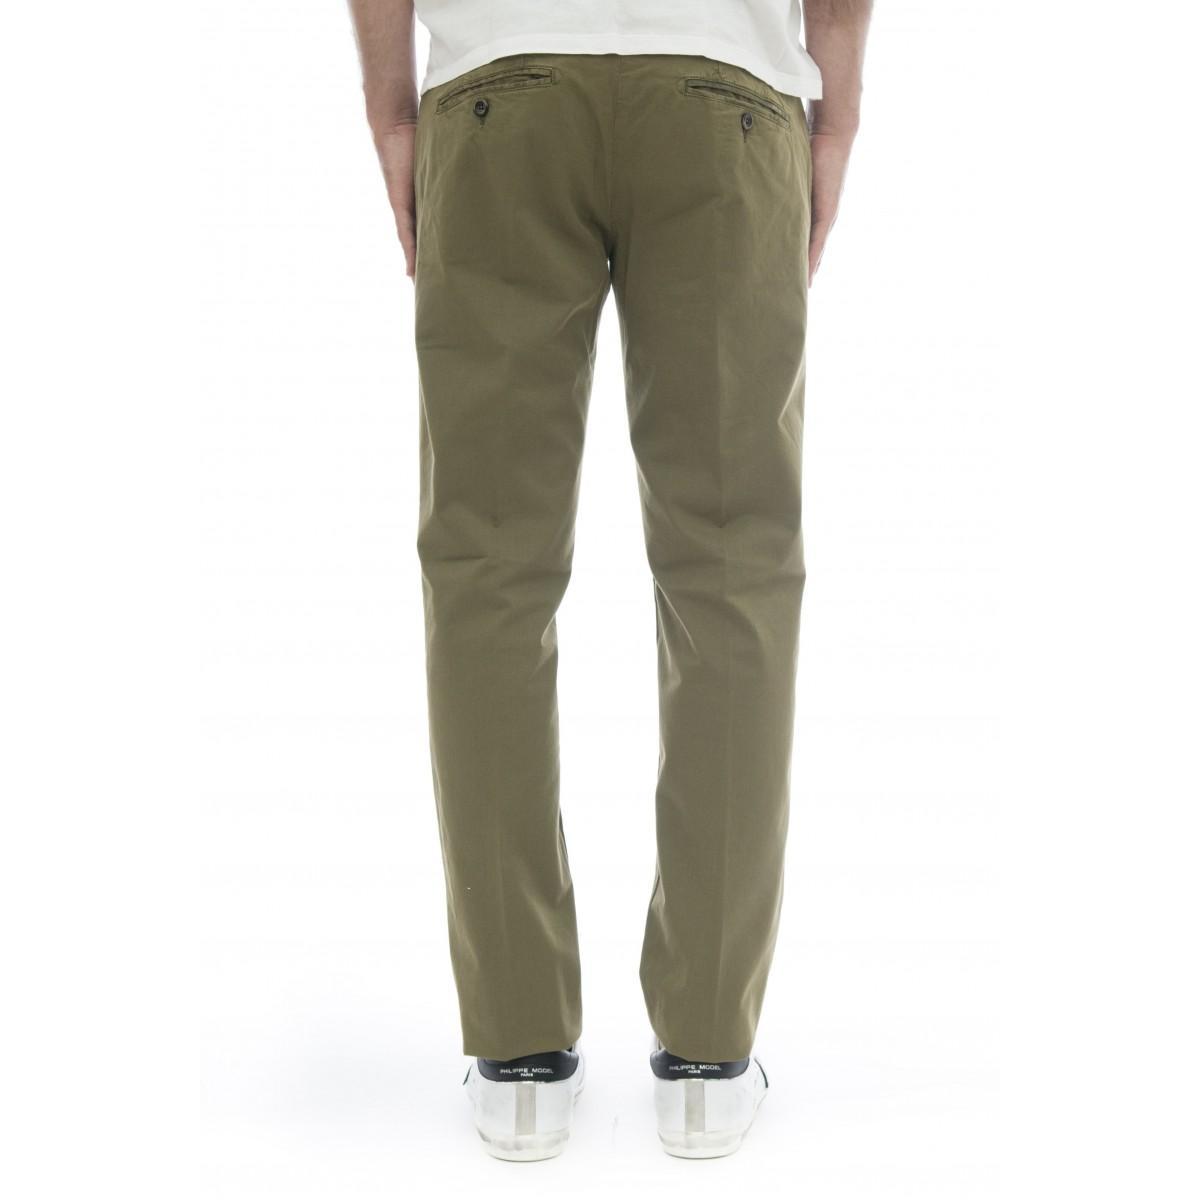 Pantalone uomo - 08l 83 gabardina tinta capo slim strech